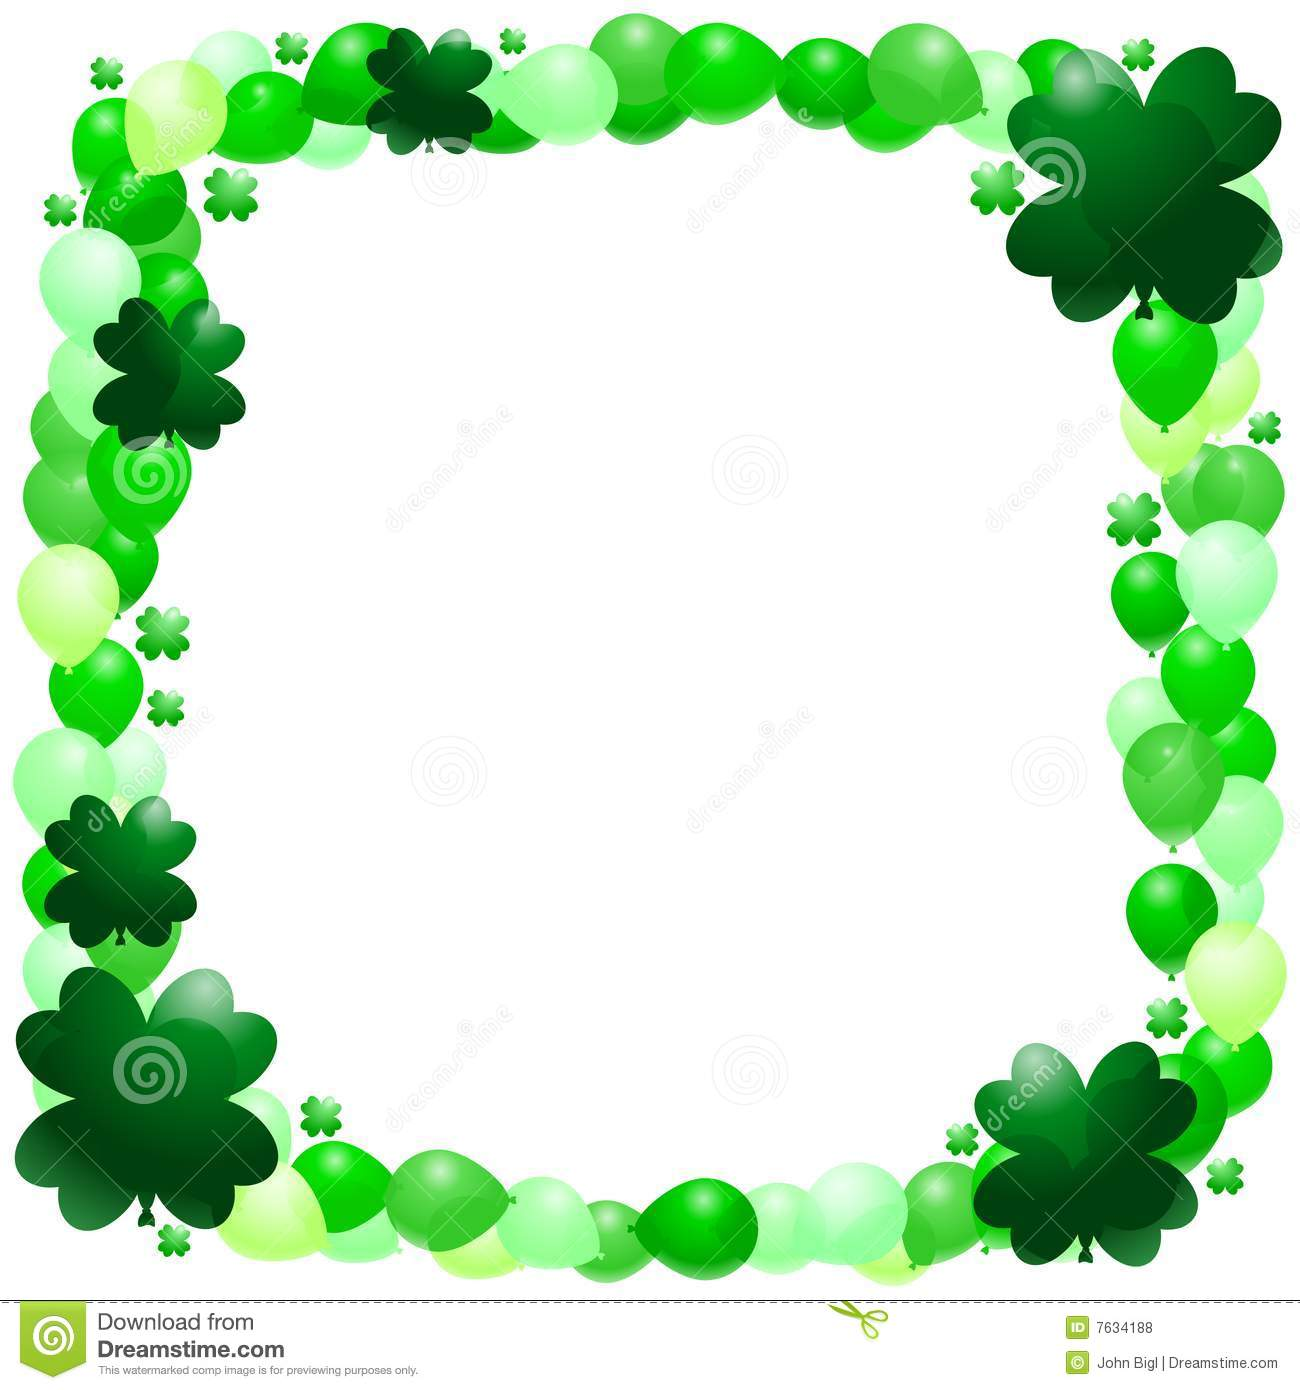 St. Patrick's Day Borders |St Patricks Border